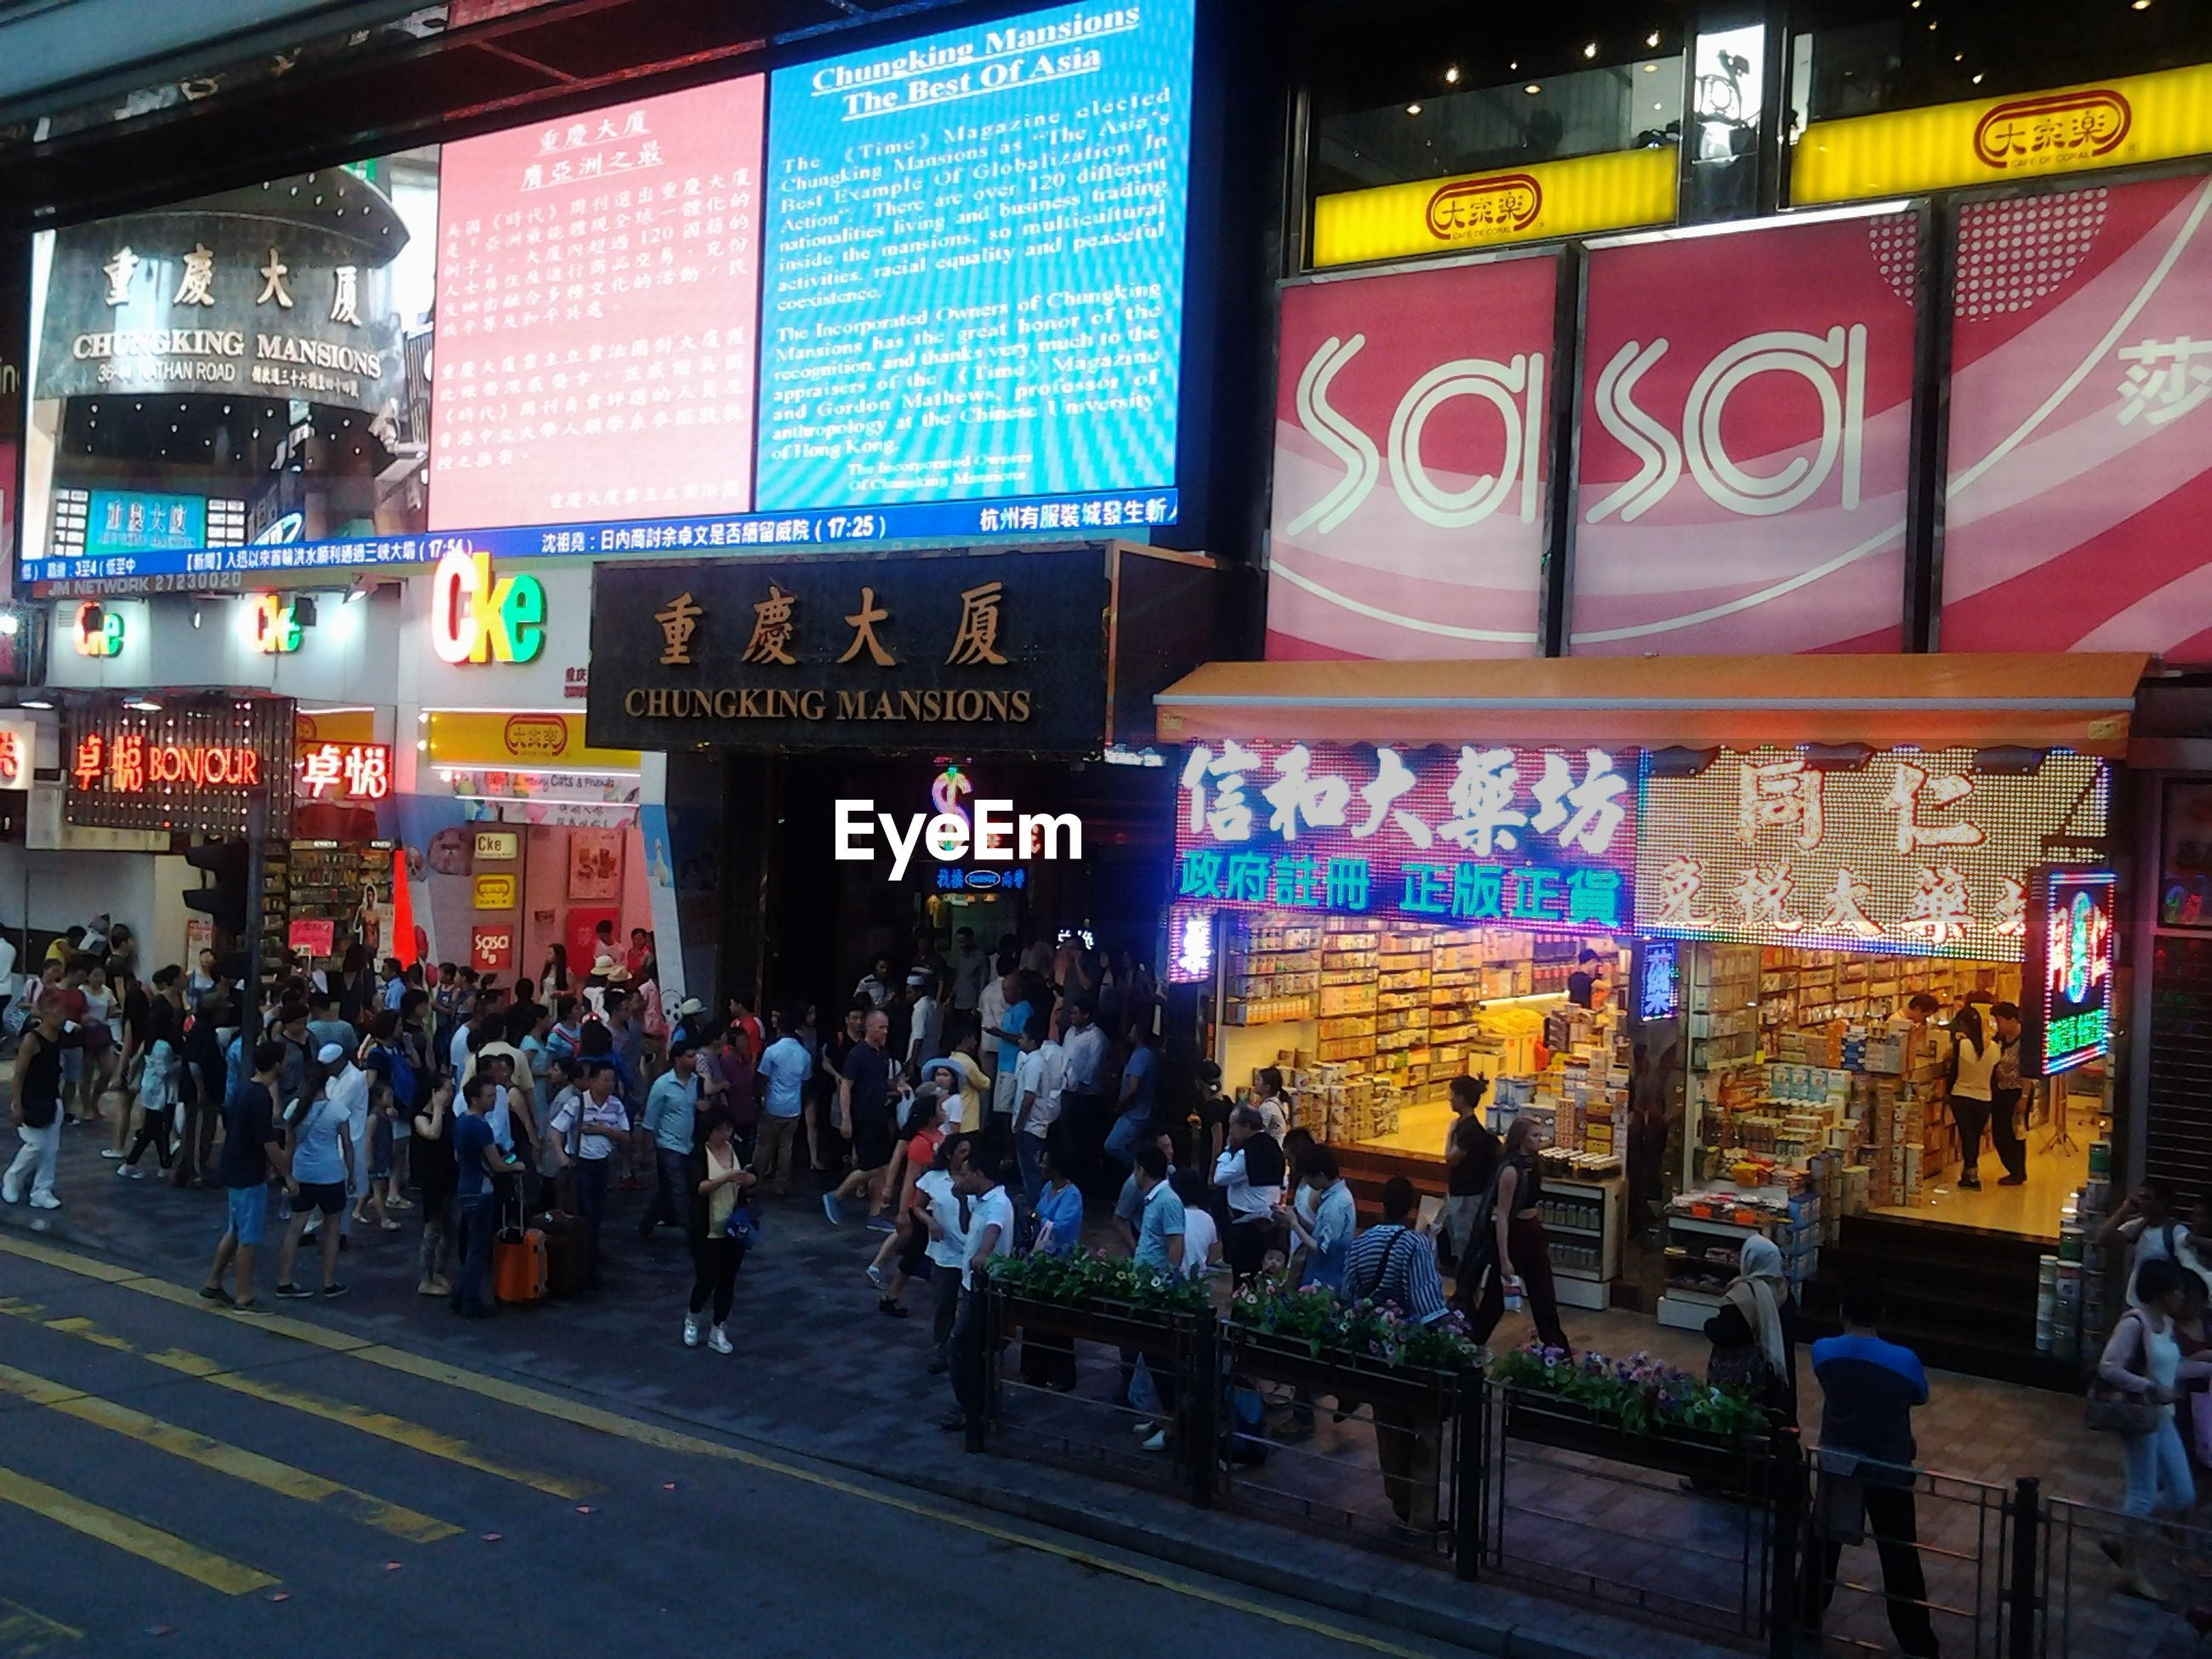 Crowd on city street against illuminated building